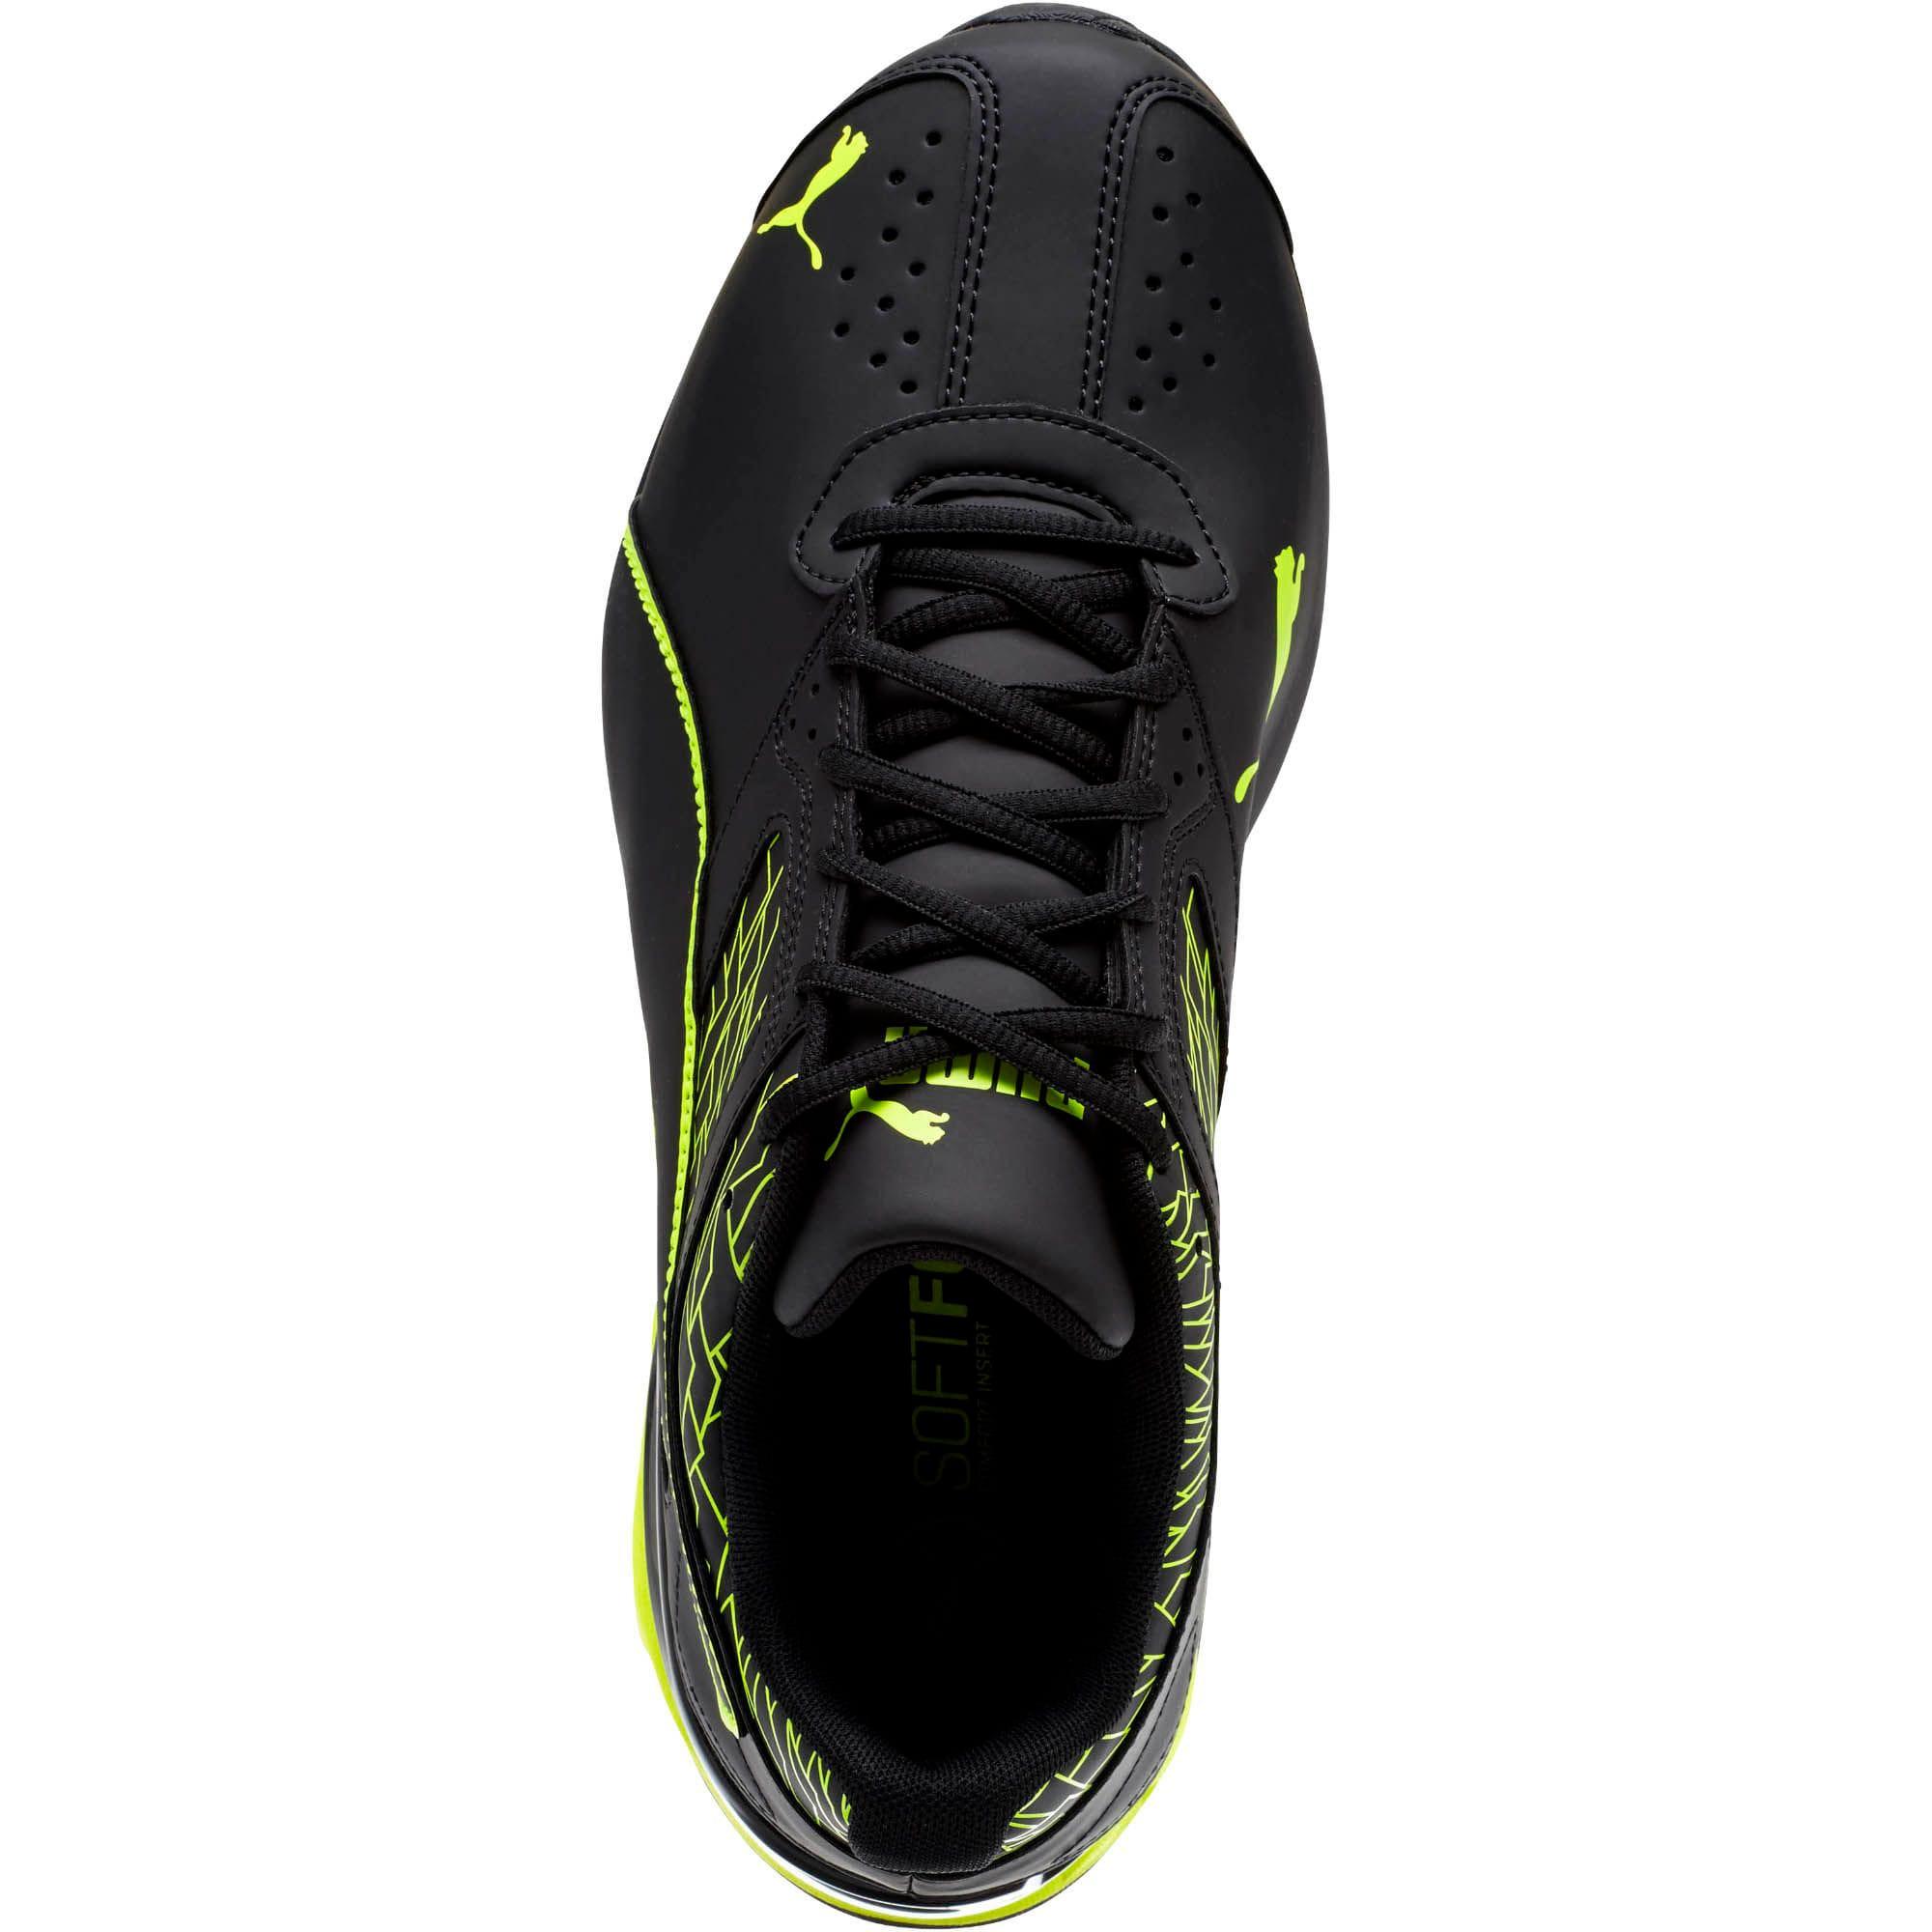 Thumbnail 5 of Tazon 6 Fracture FM Men's Sneakers, Puma Black-Safety Yellow, medium